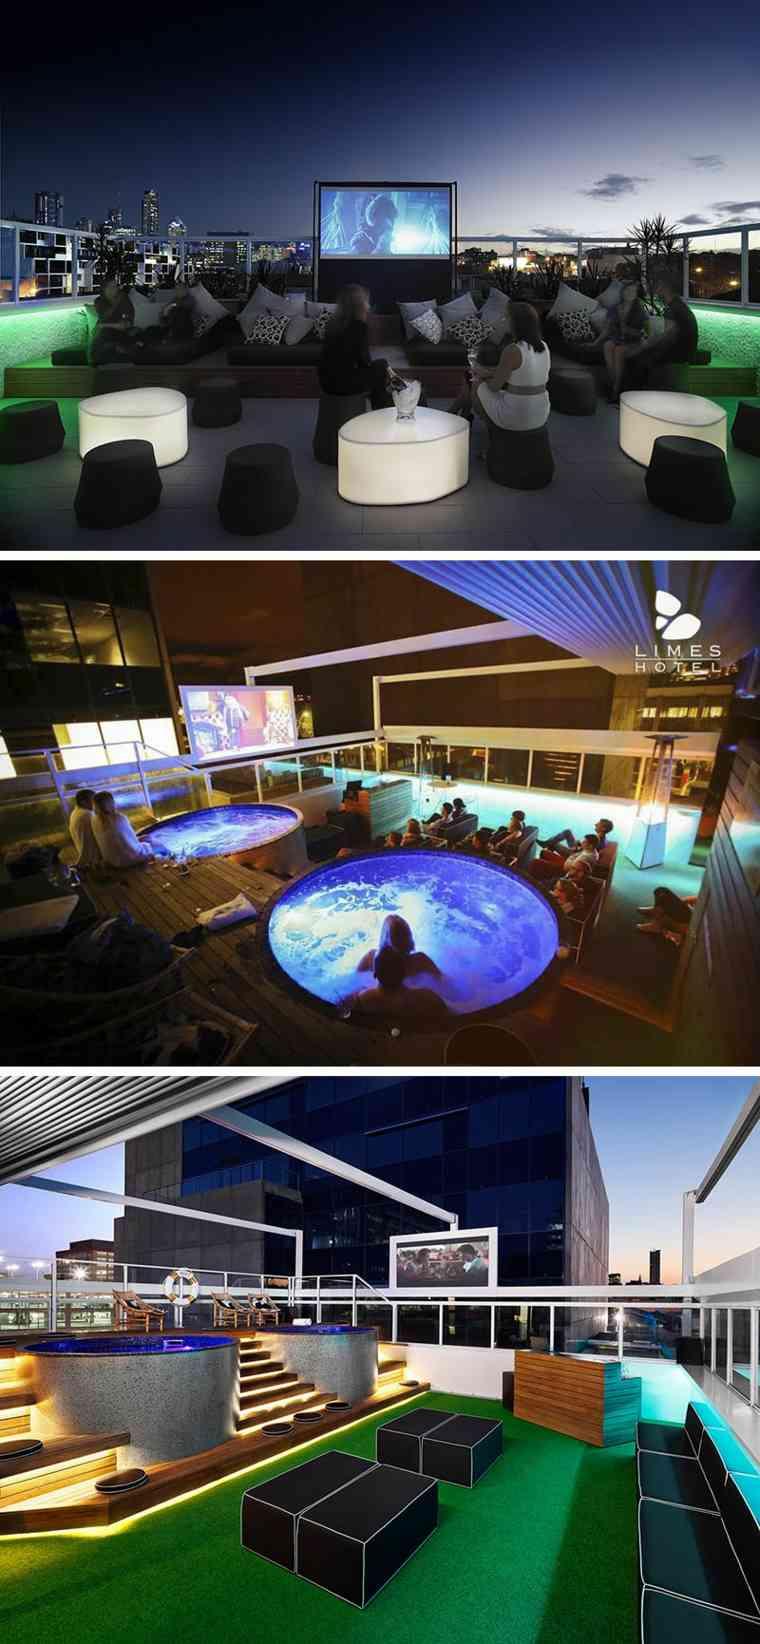 hoteles romanticos terrazas Limes Hotel Australia diseno ideas